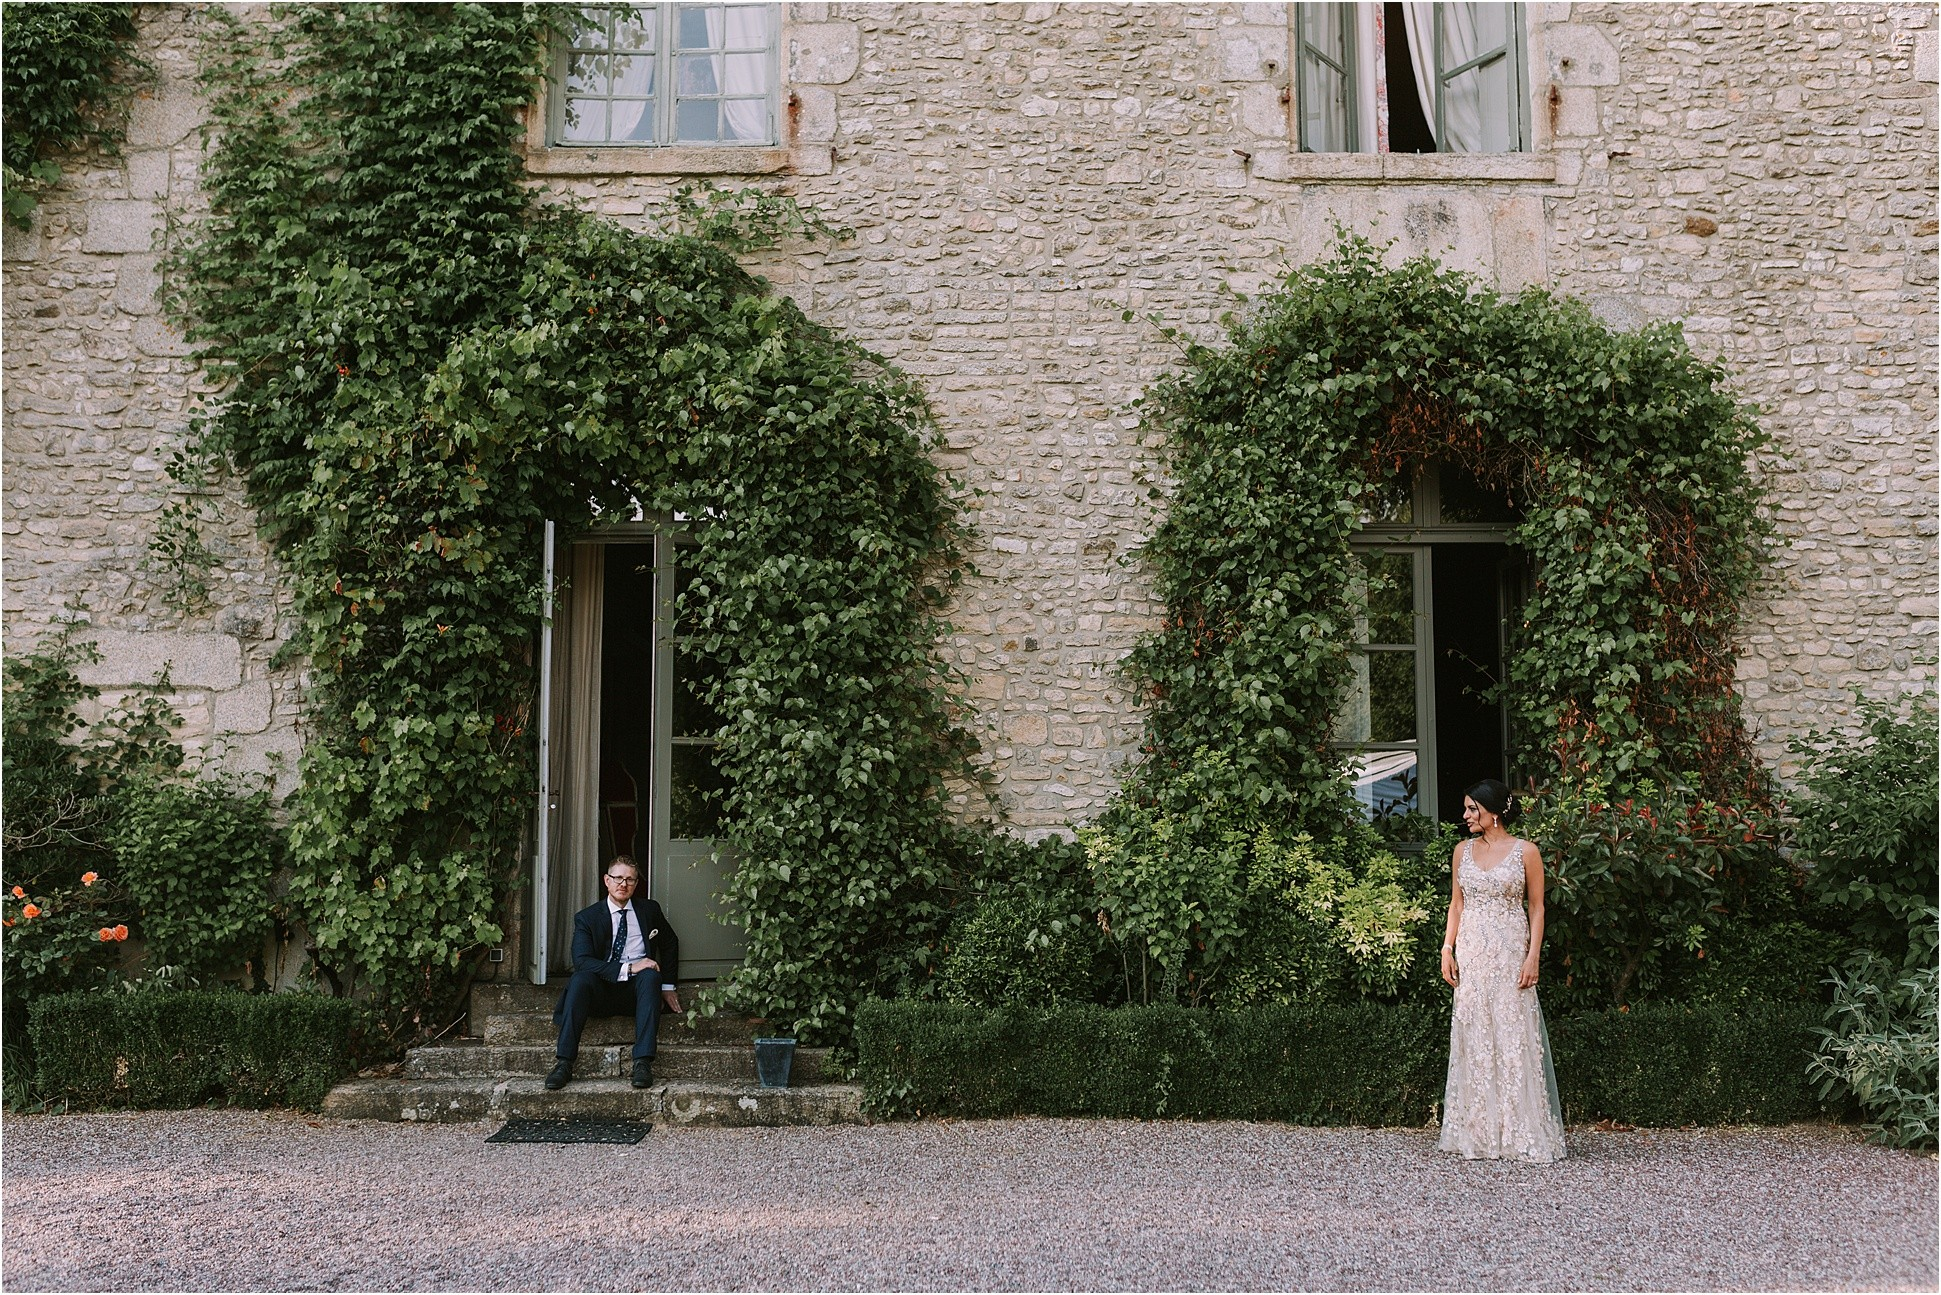 Kateryna-photos-photographe-mariage-chateau-st-paterne-mayenne-normandie_0182.jpg